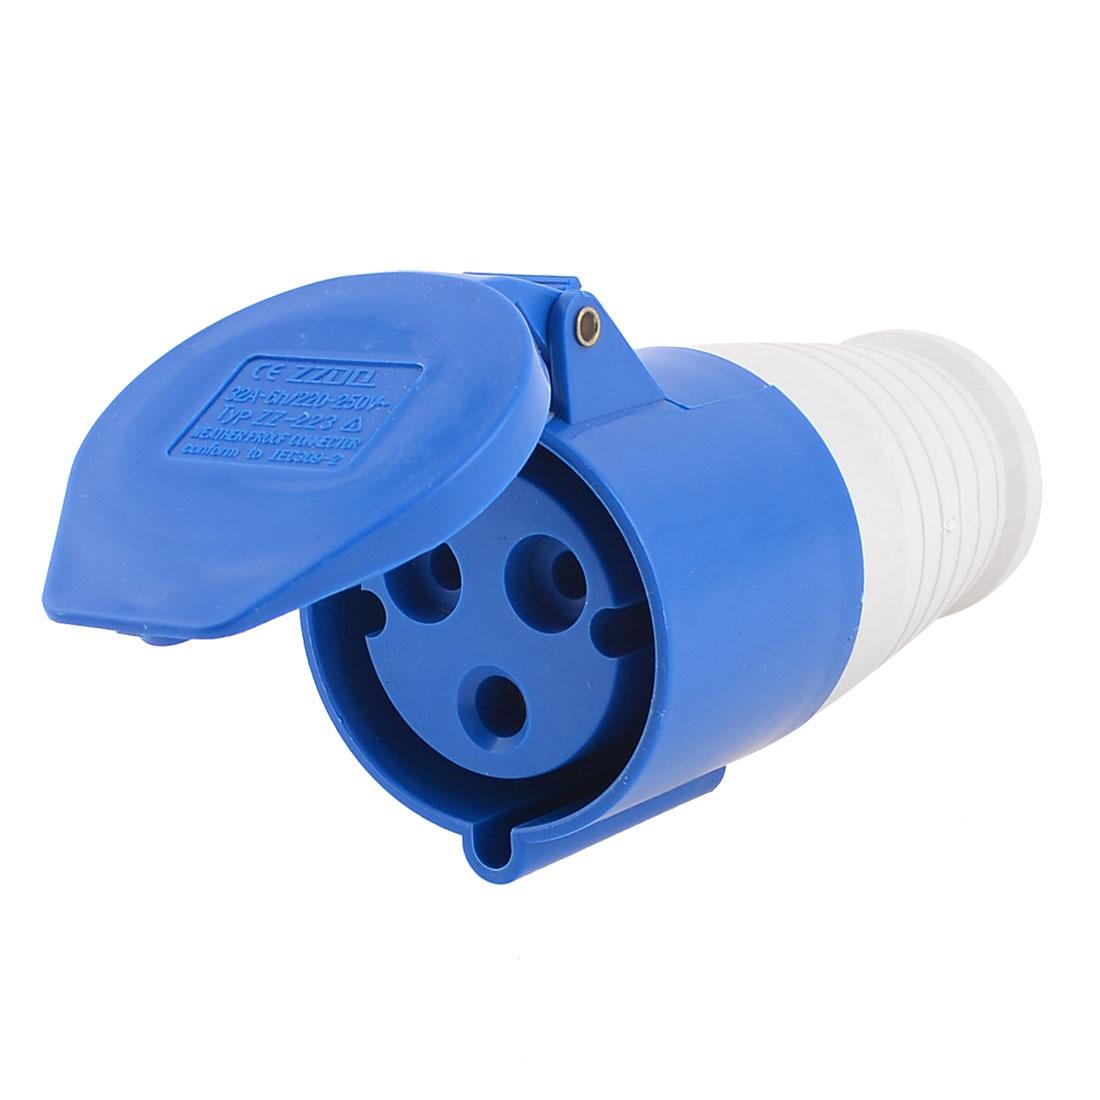 220-250V 2P+E Waterproof Industrial Socket Connector ZZ-223